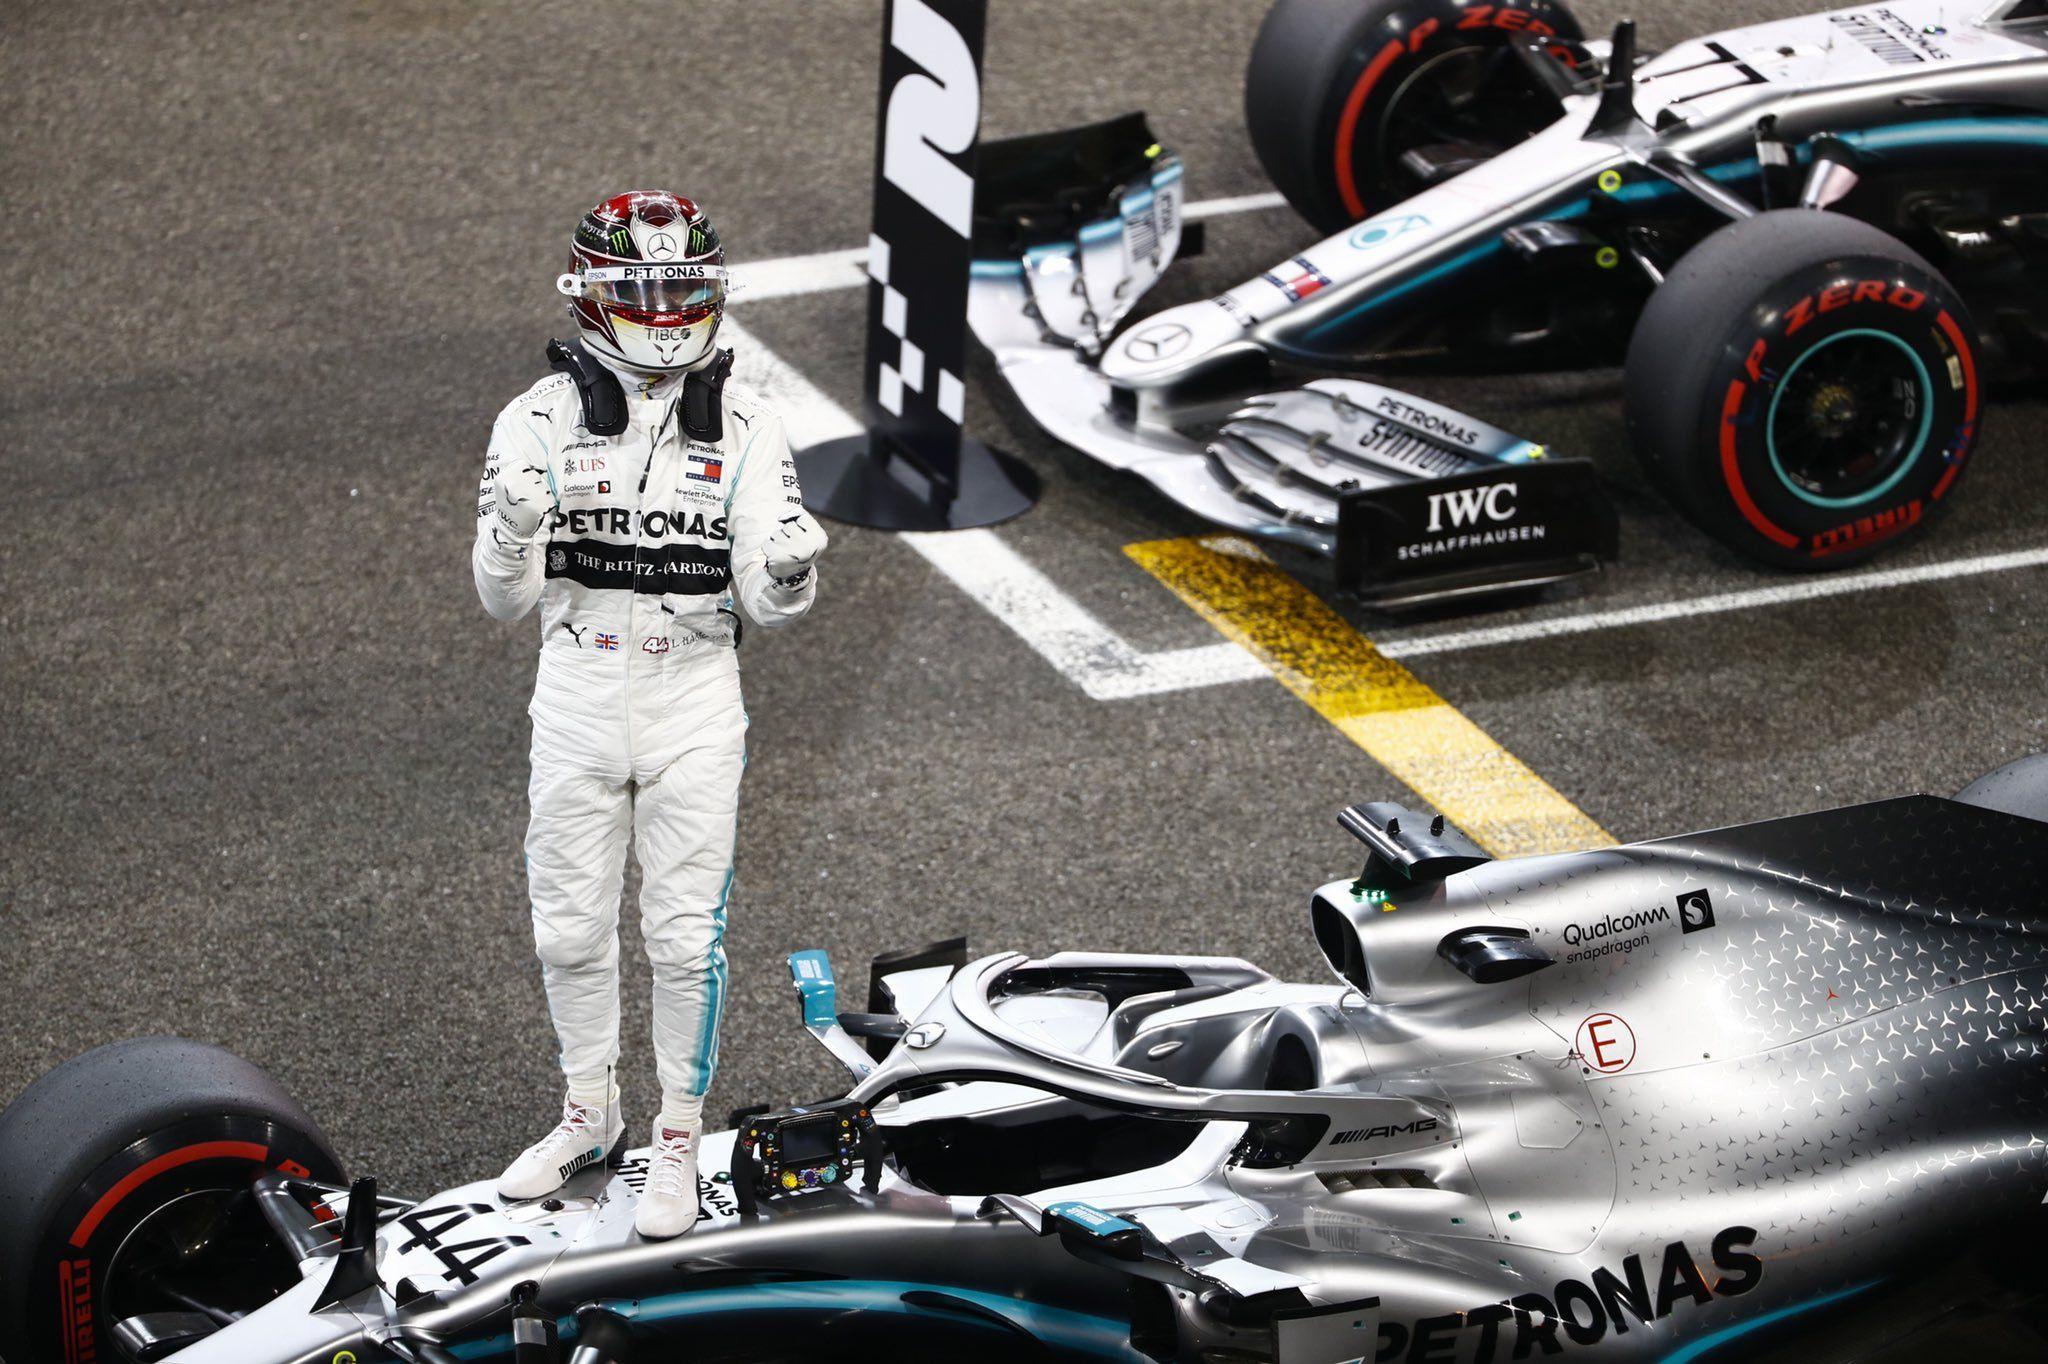 Lewis Hamilton, Abu Dhabi GP